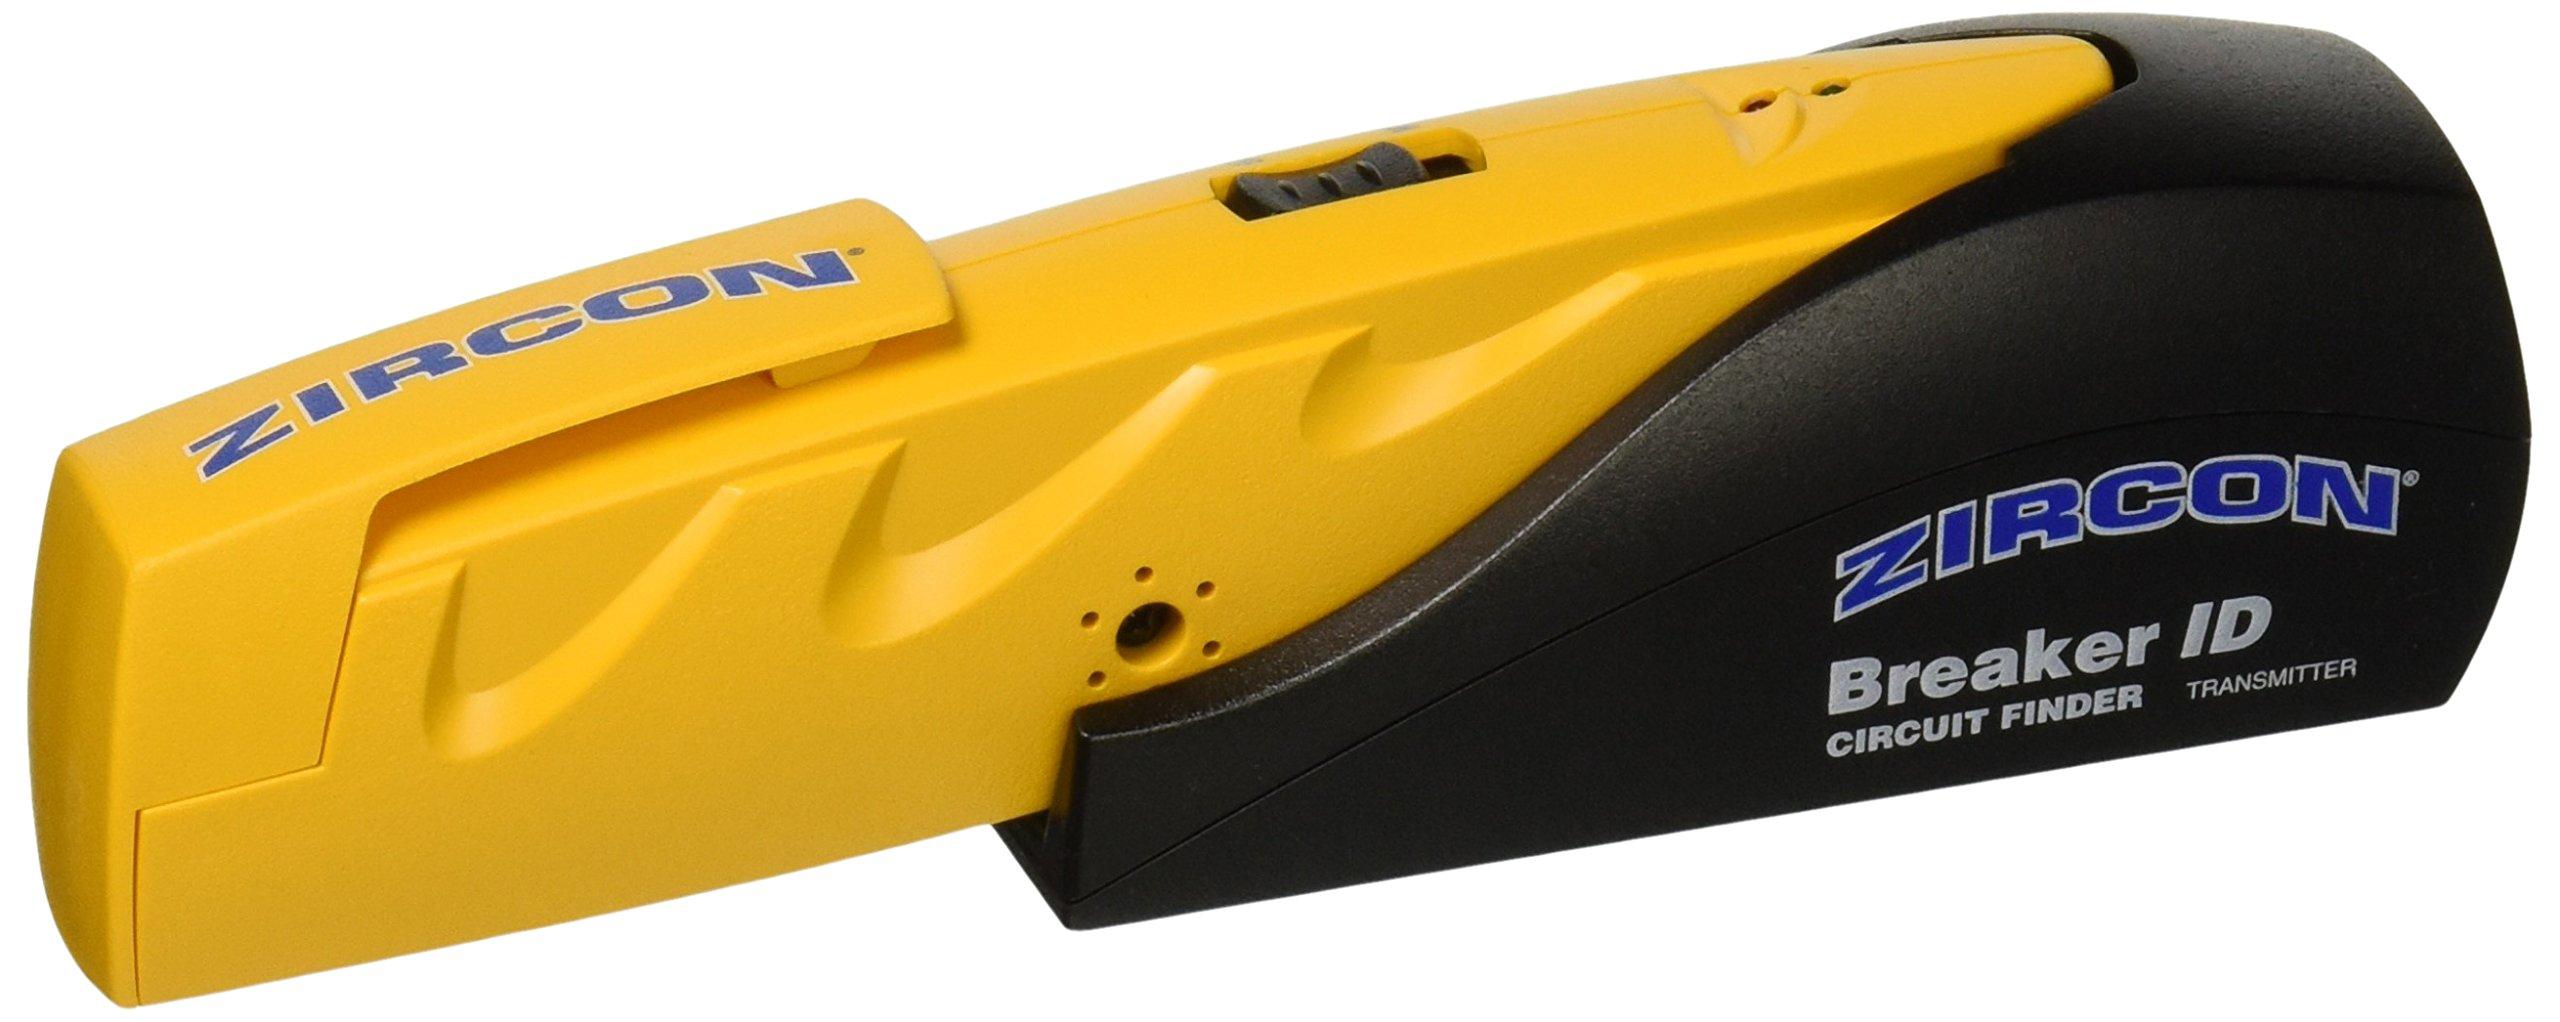 Zircon Breaker ID - DIY Circuit Breaker Finder / Compatible with Outlets up to 120 Volts / Circuit Breaker Identifier FFP